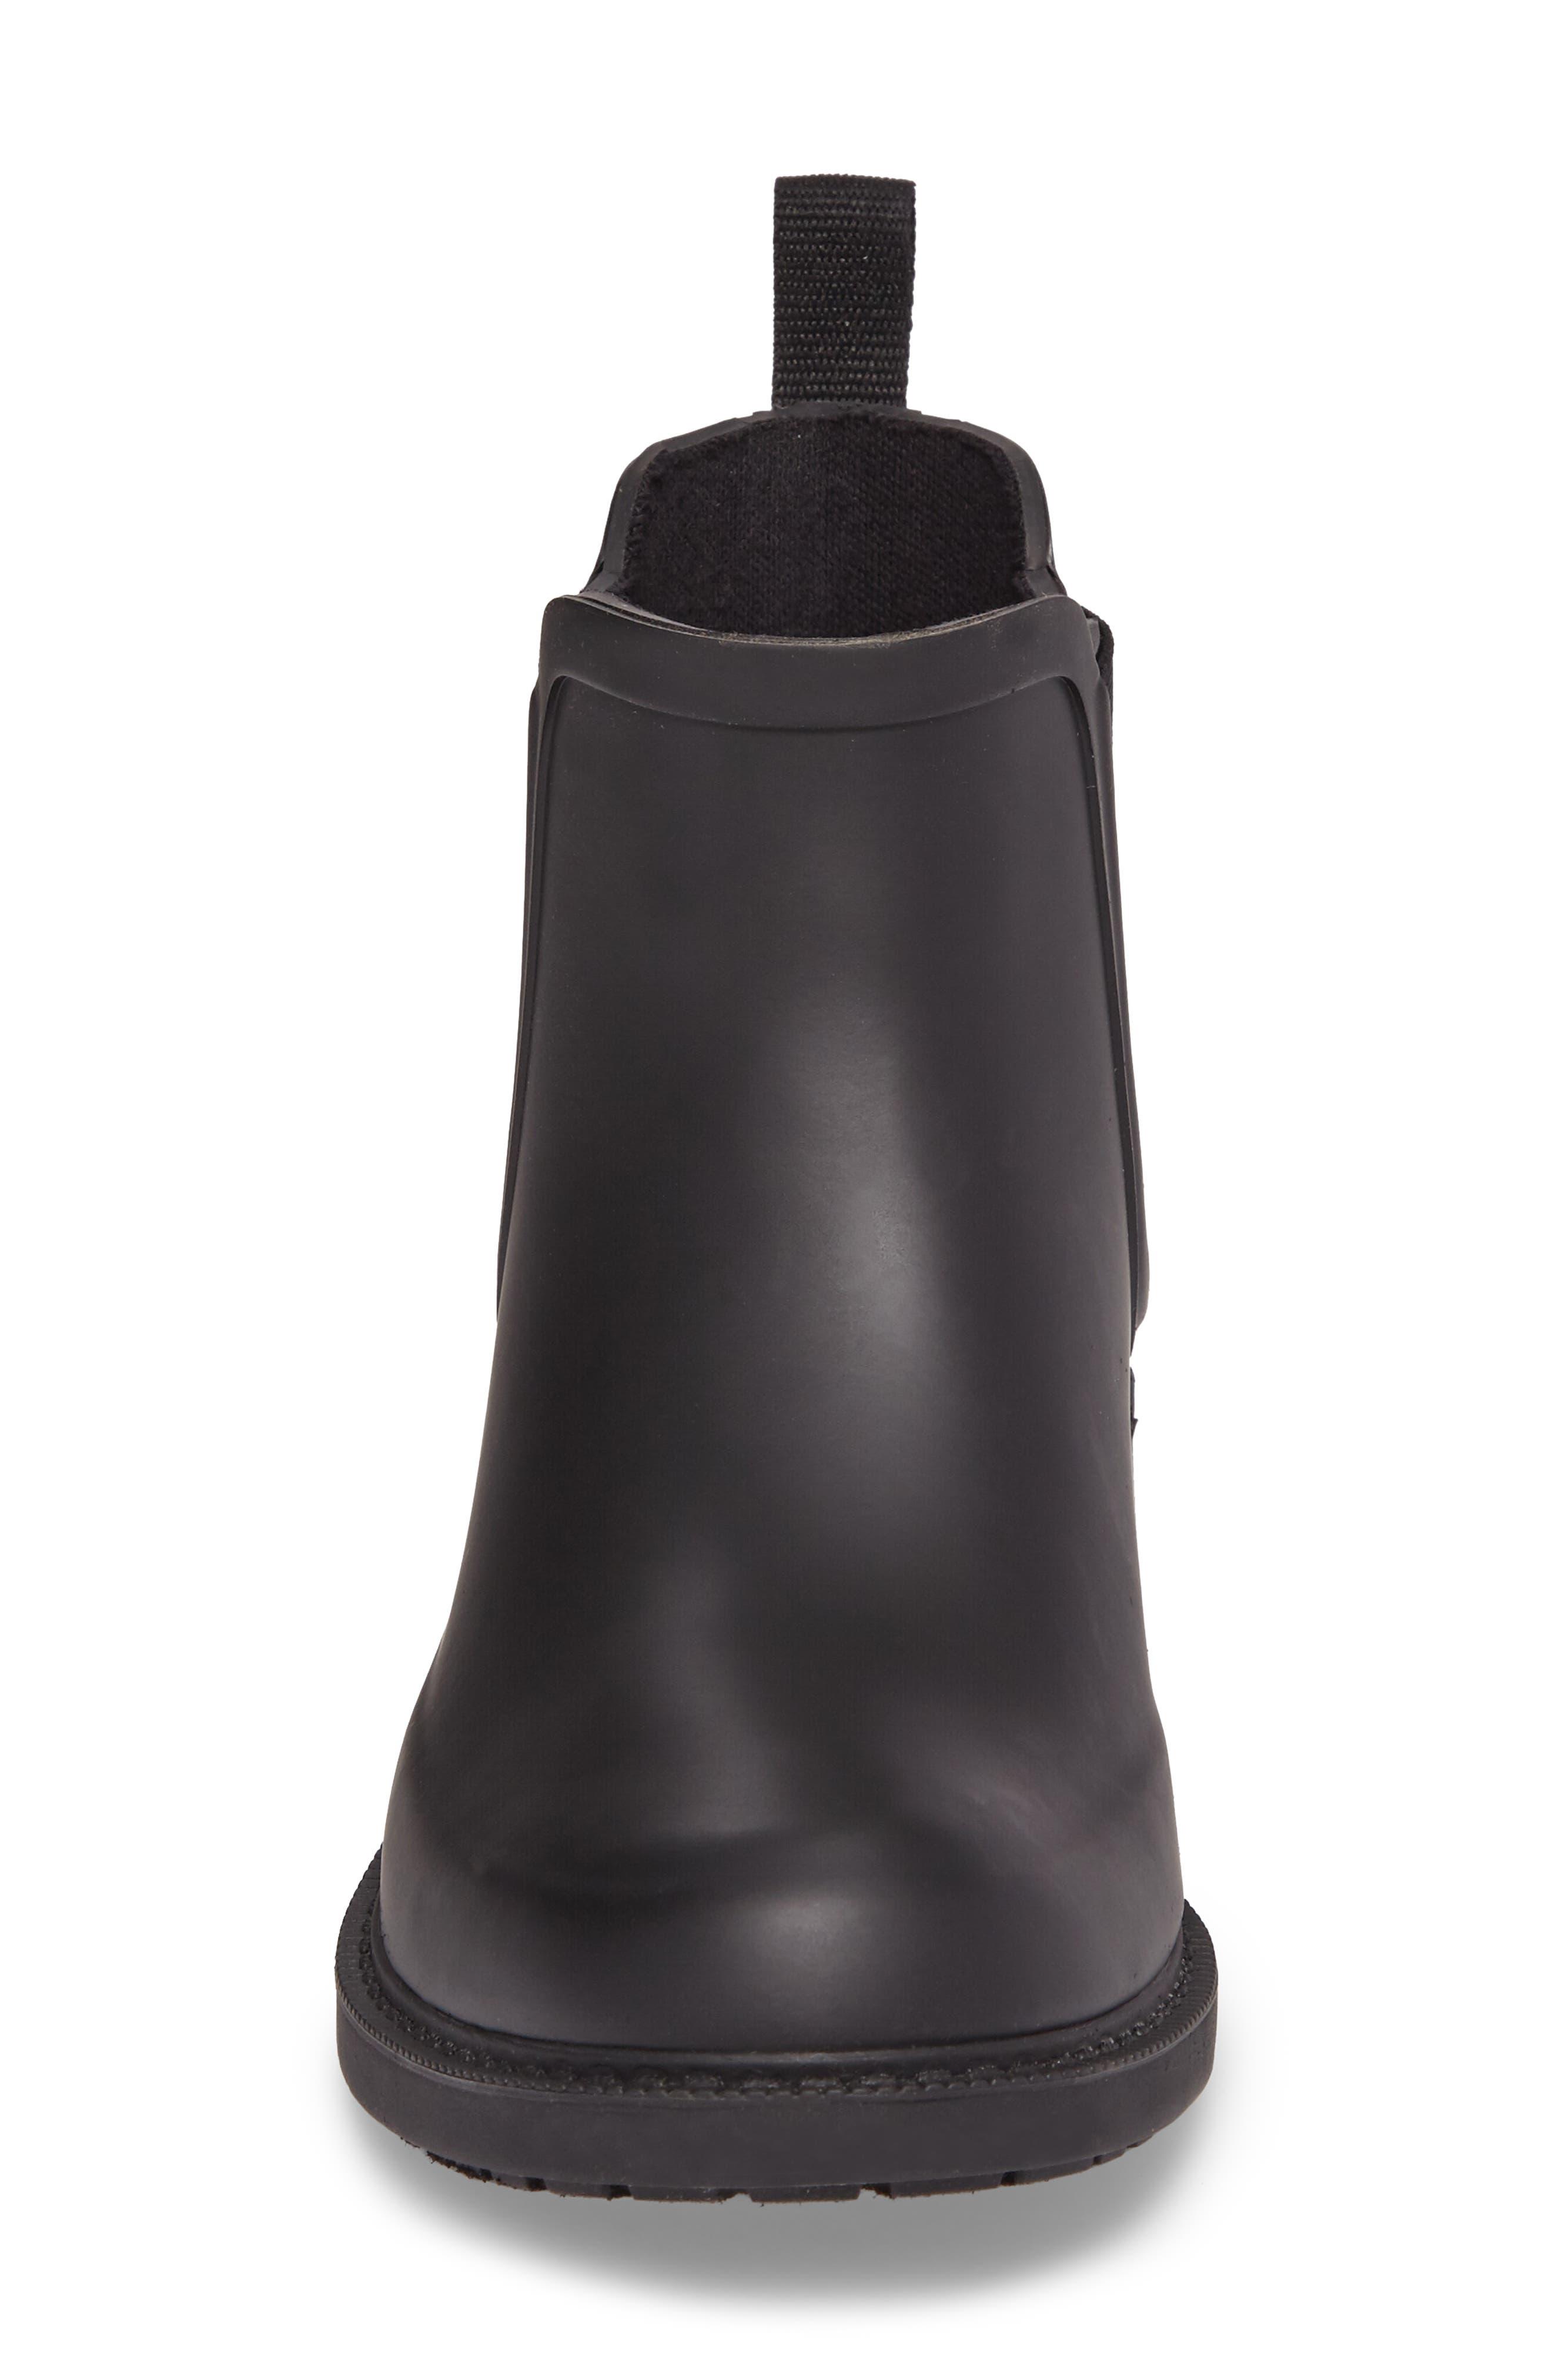 MADEWELL, The Chelsea Rain Boot, Alternate thumbnail 4, color, TRUE BLACK RUBBER